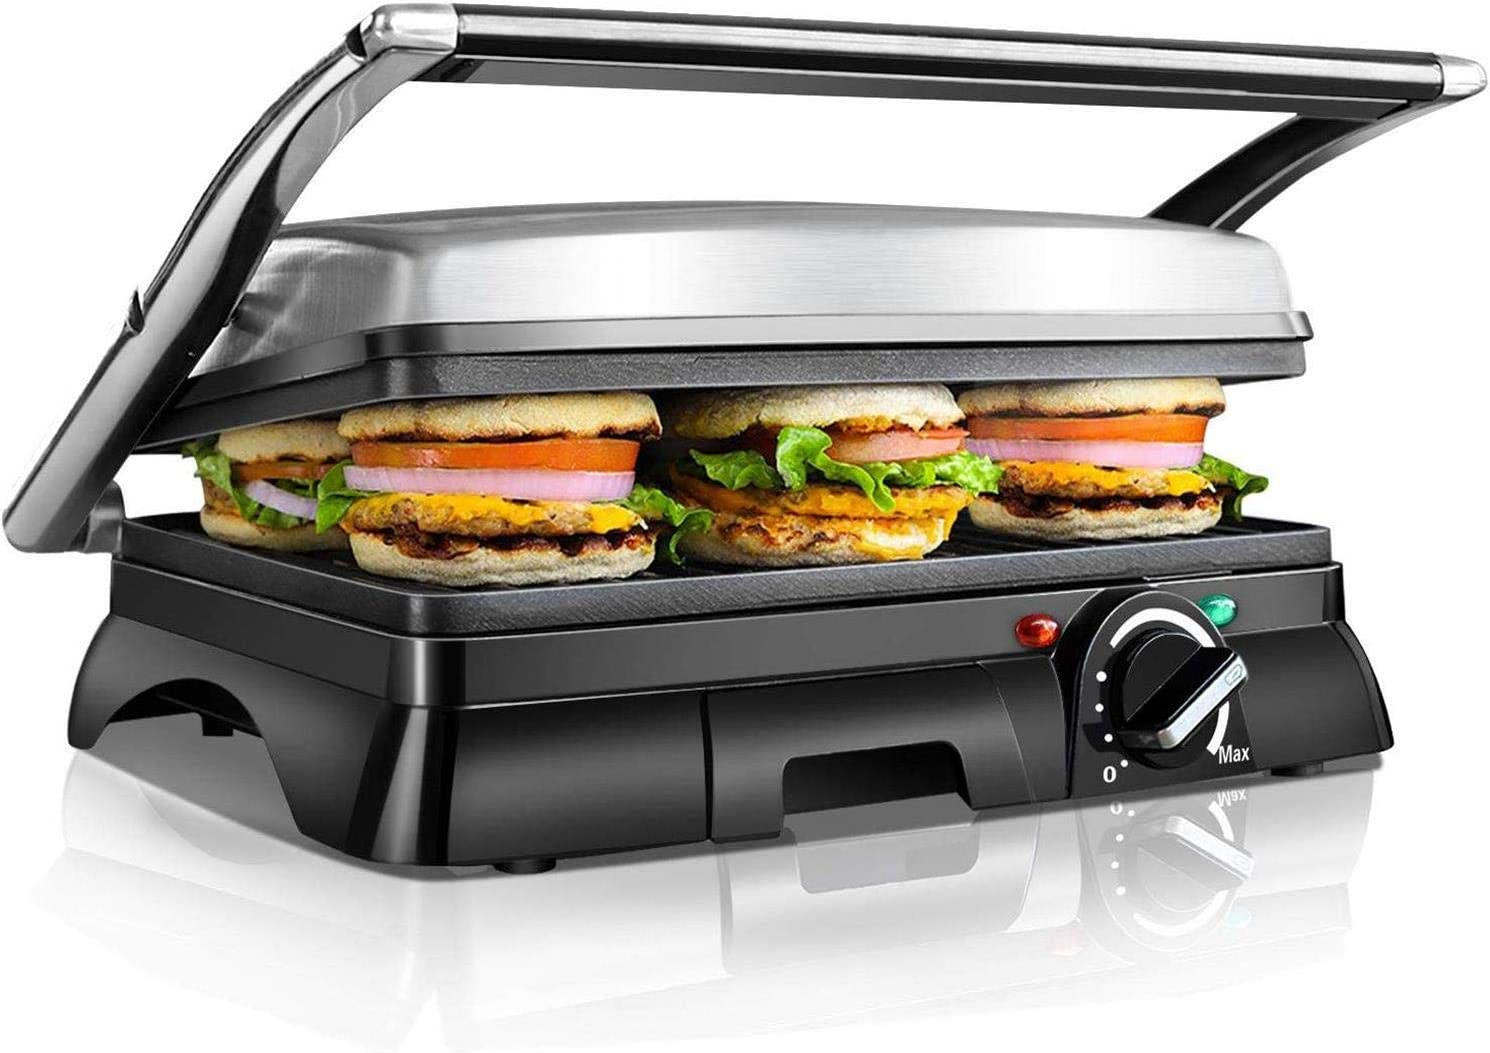 Aigostar Samson 30KLU – Grill, parrilla, panini, 2000W, sandwichera con tapa flotante. placas antiadherentes grandes 29,5 x 23,5 cm, apertura 180 °, control temperatura, libre de BPA. Diseño exclusivo